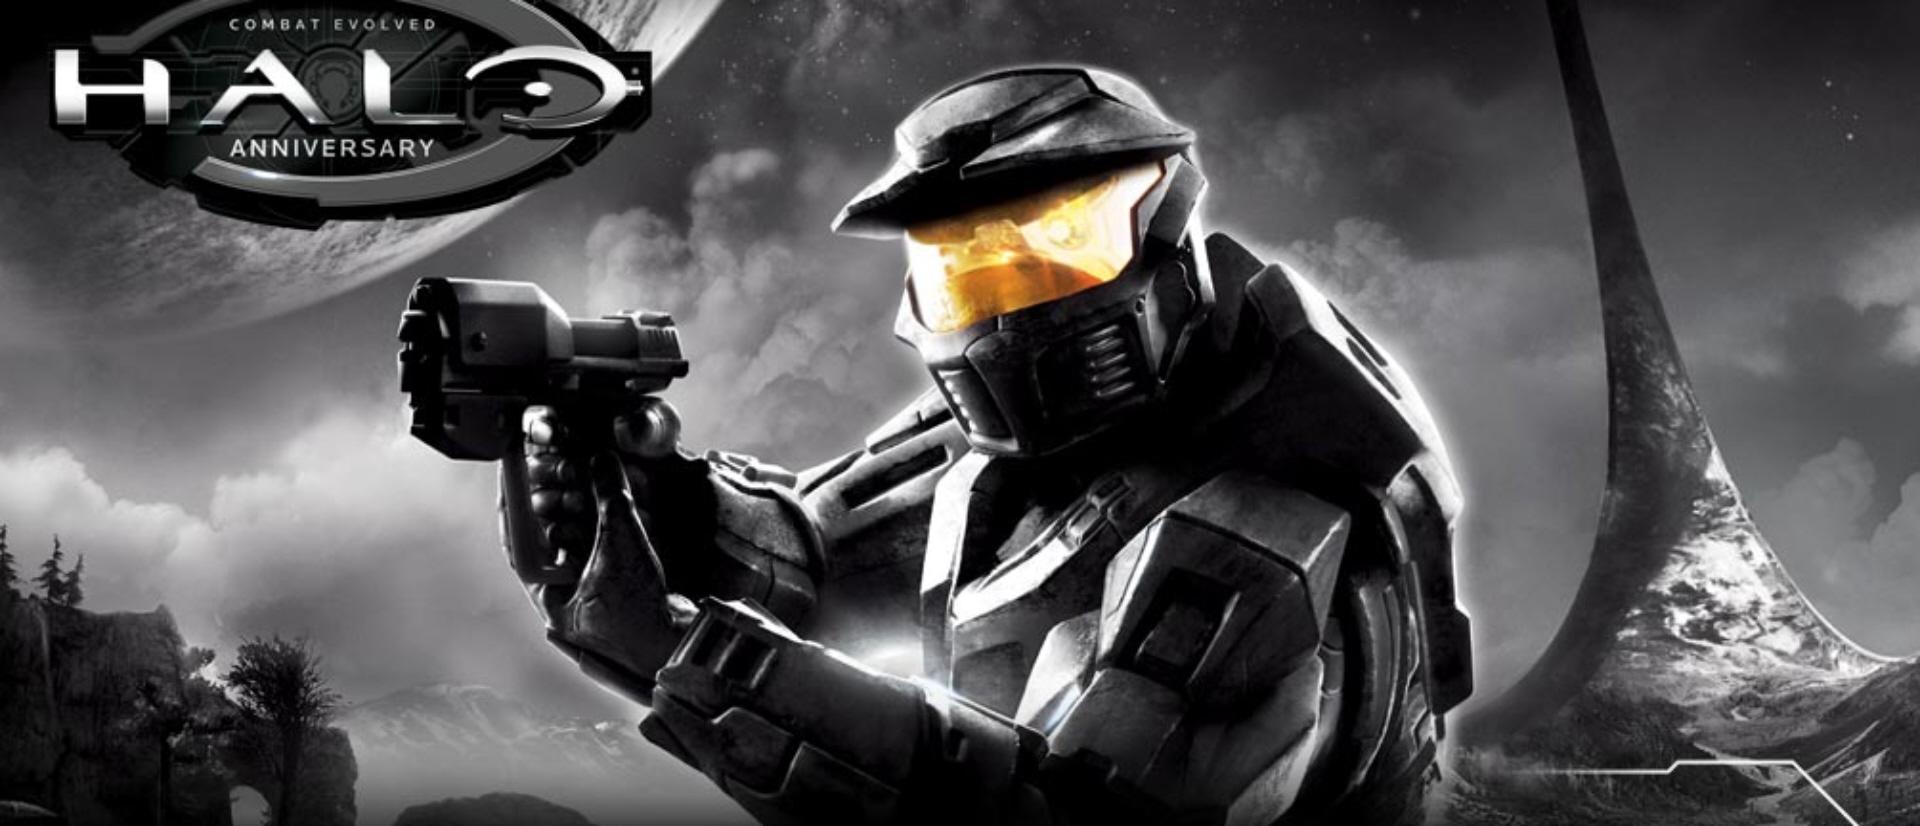 Halo Combat Evolved Wallpaper 1920x826